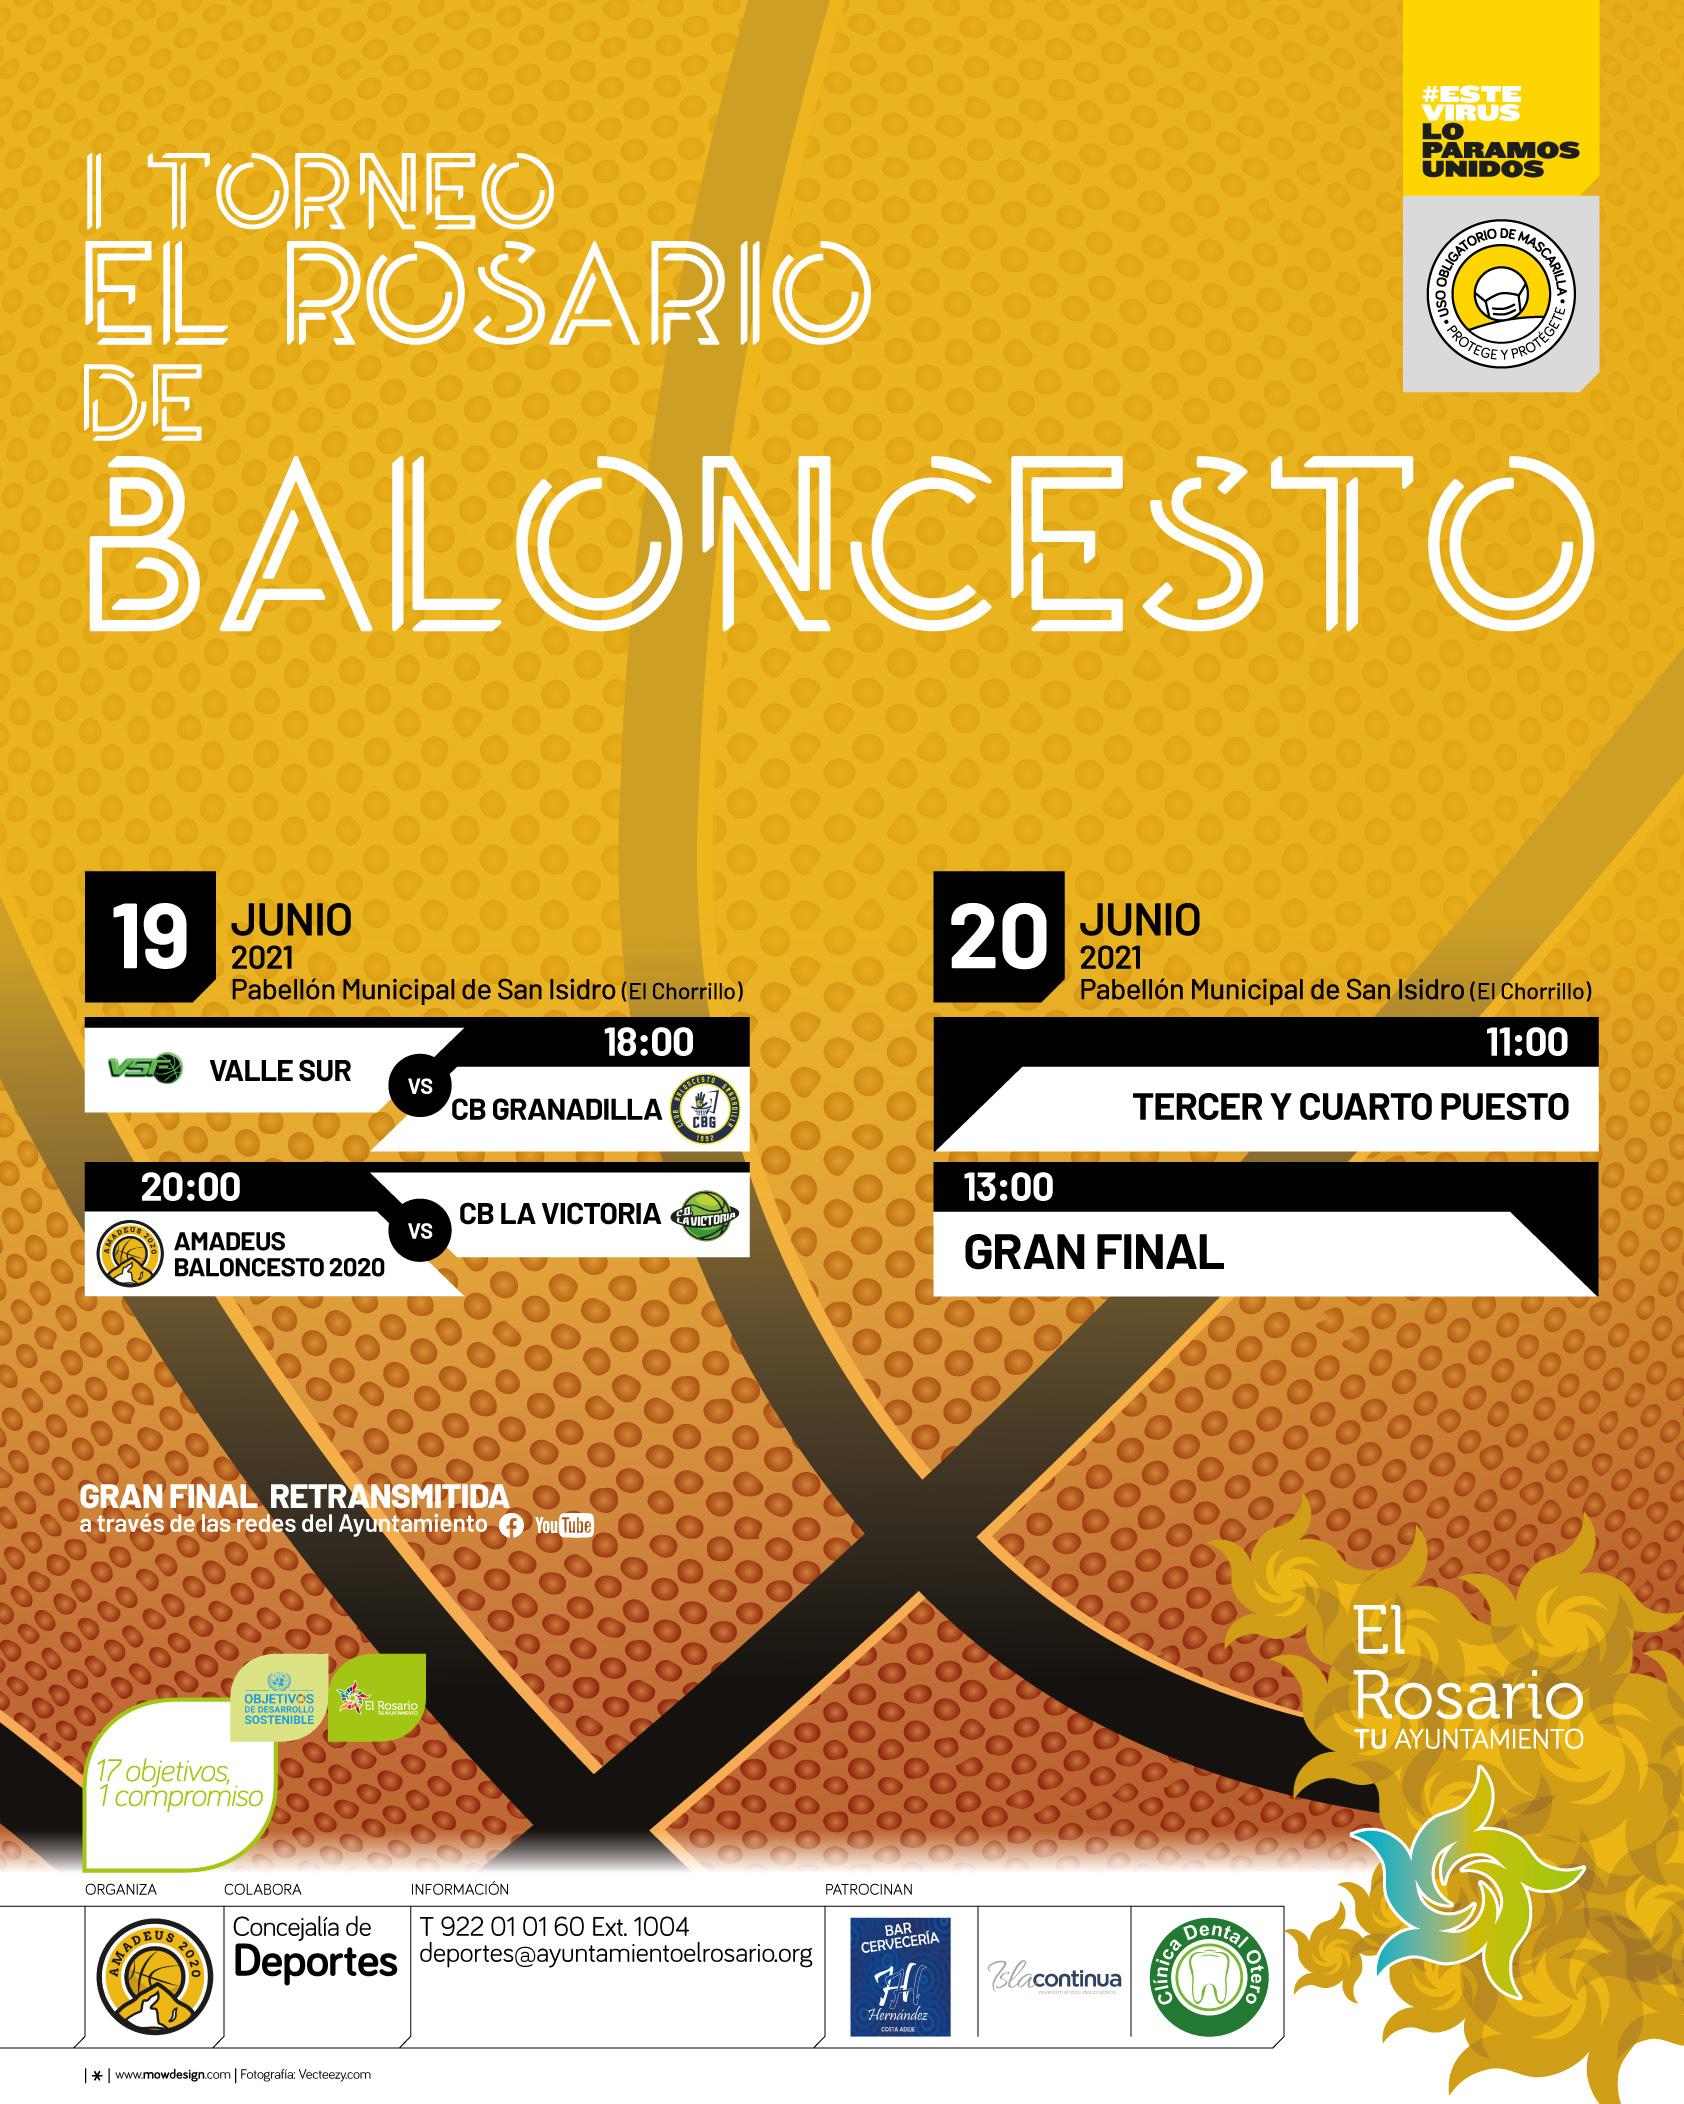 TORNEO-ELROSARIO_BALONCESTO-20210619-CARTEL_A3-20210609-01af-redes